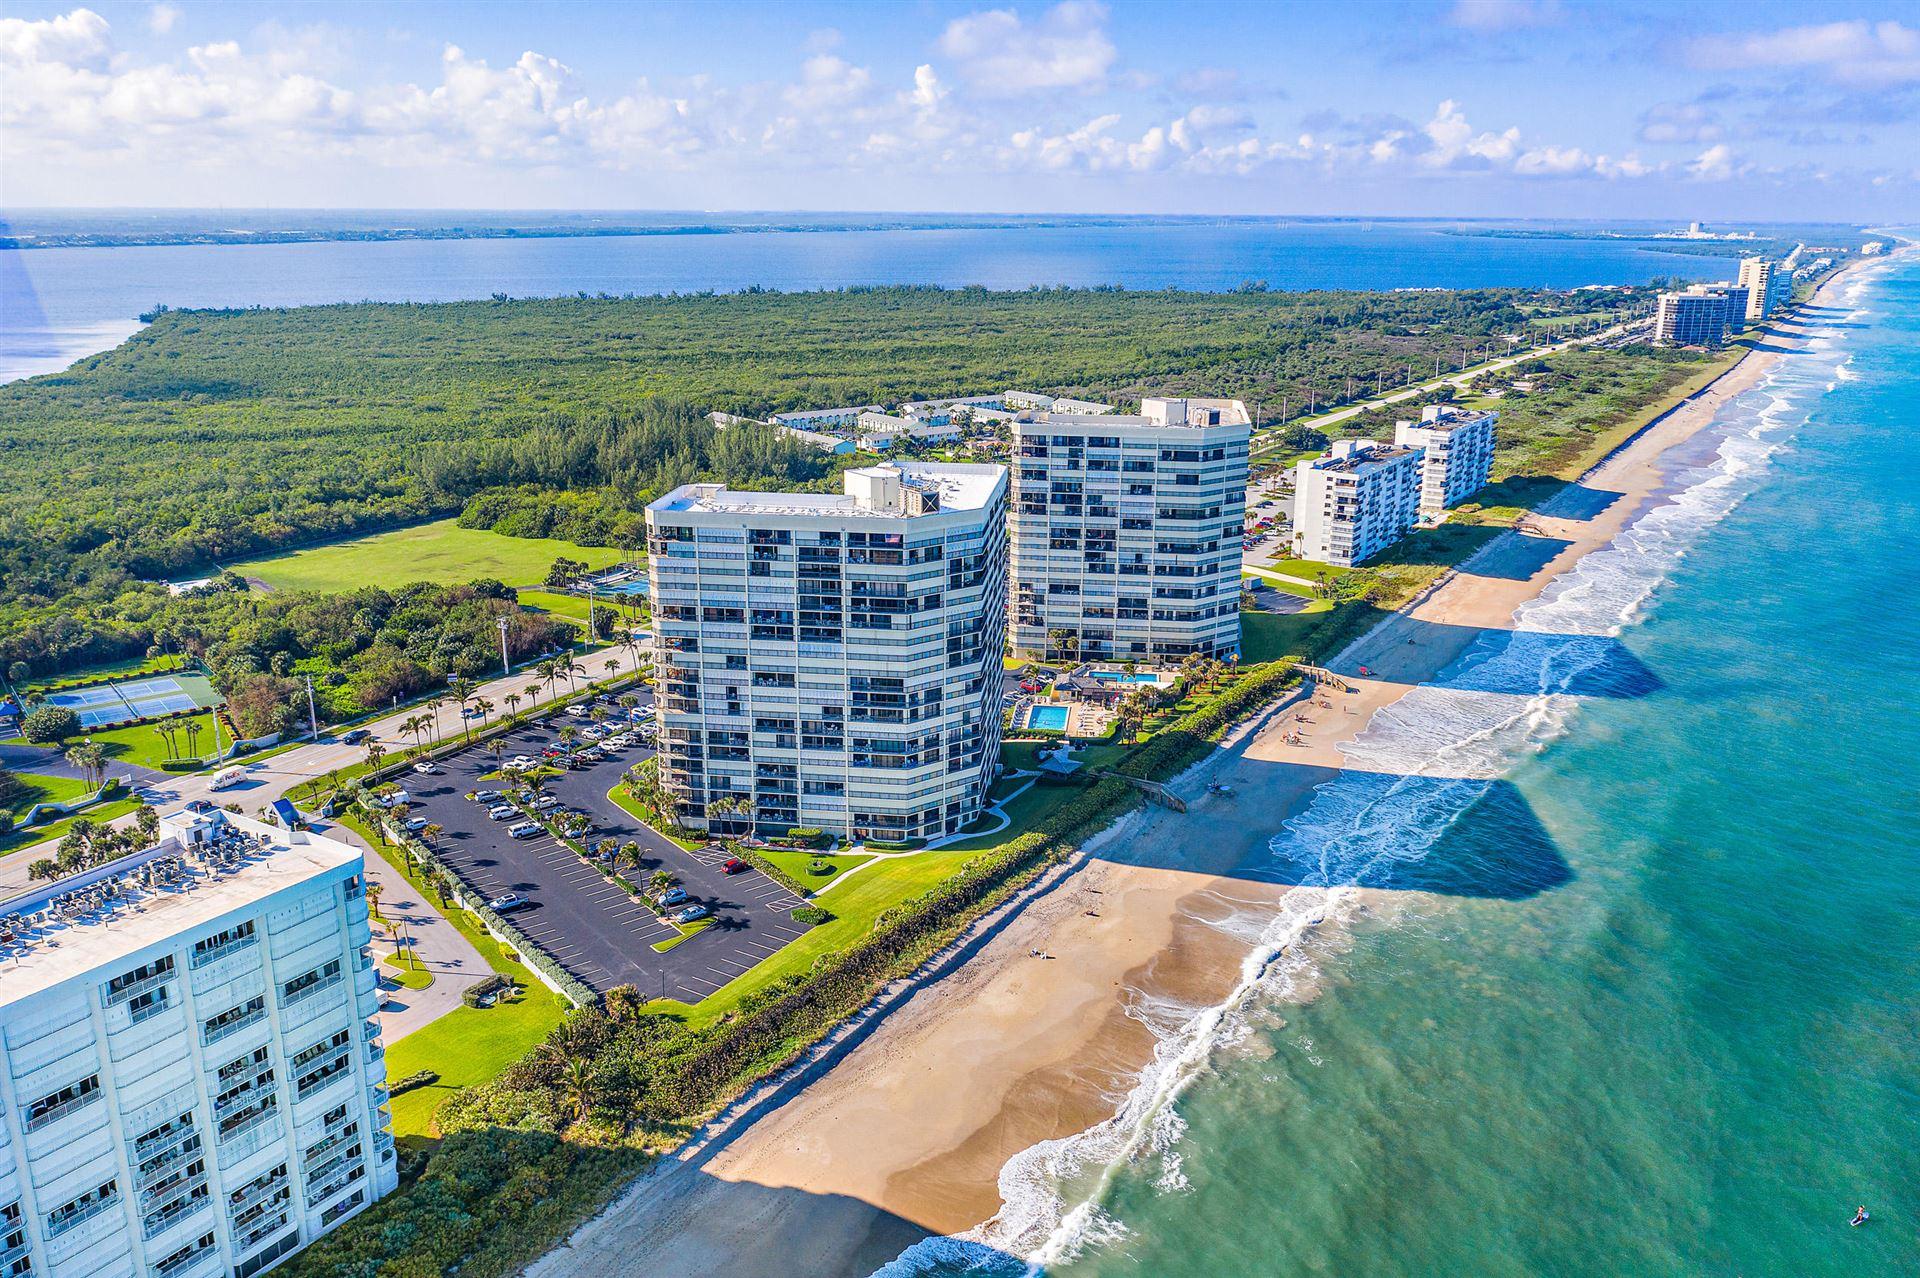 Photo of 9550 S Ocean Drive #1602, Jensen Beach, FL 34957 (MLS # RX-10671688)